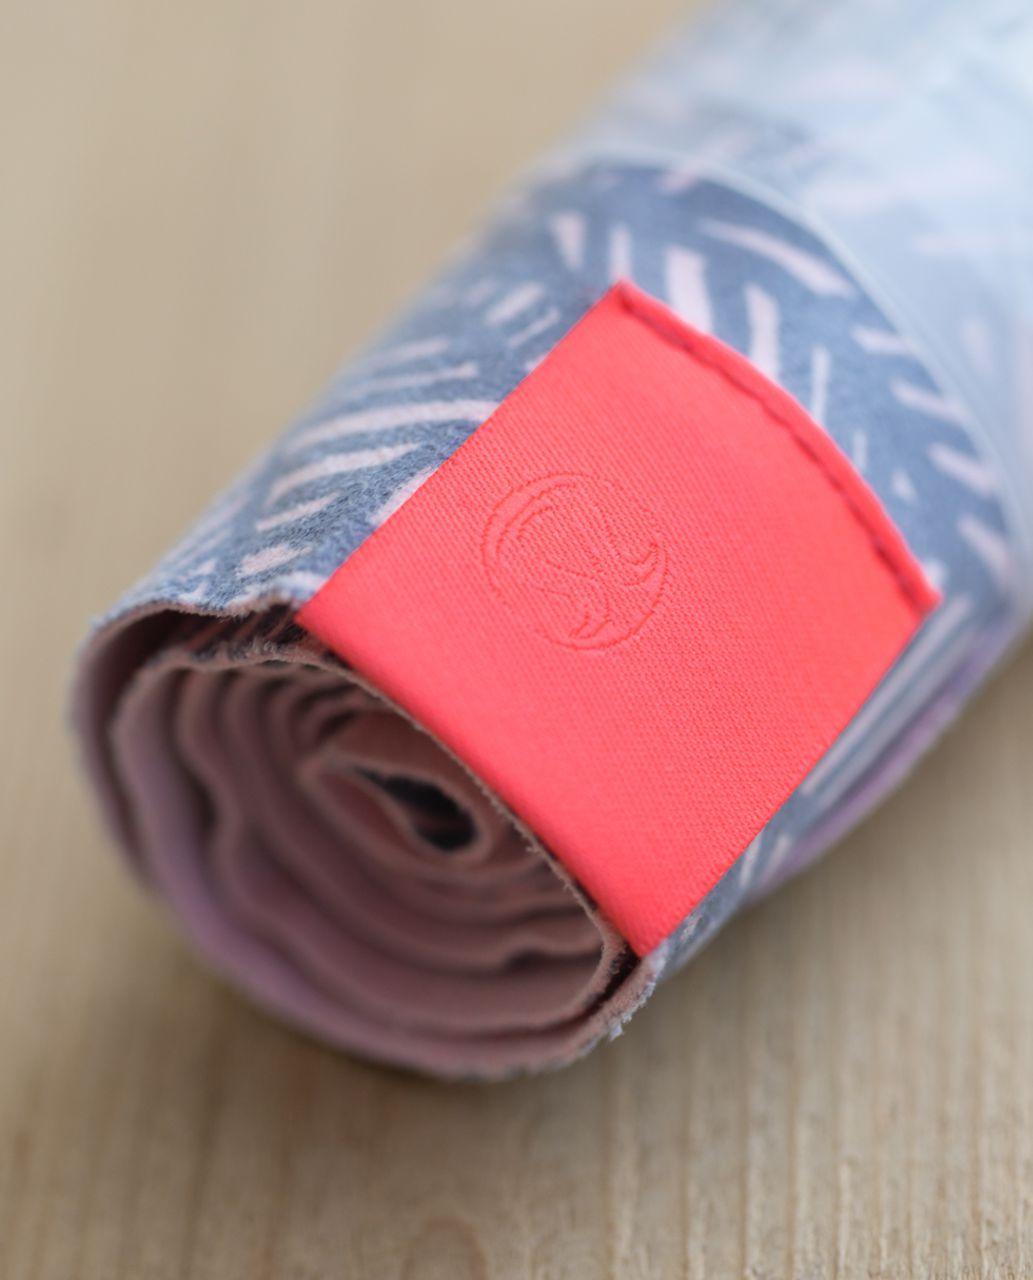 Lululemon The (Small) Towel - Banana Leaf Blush Quartz